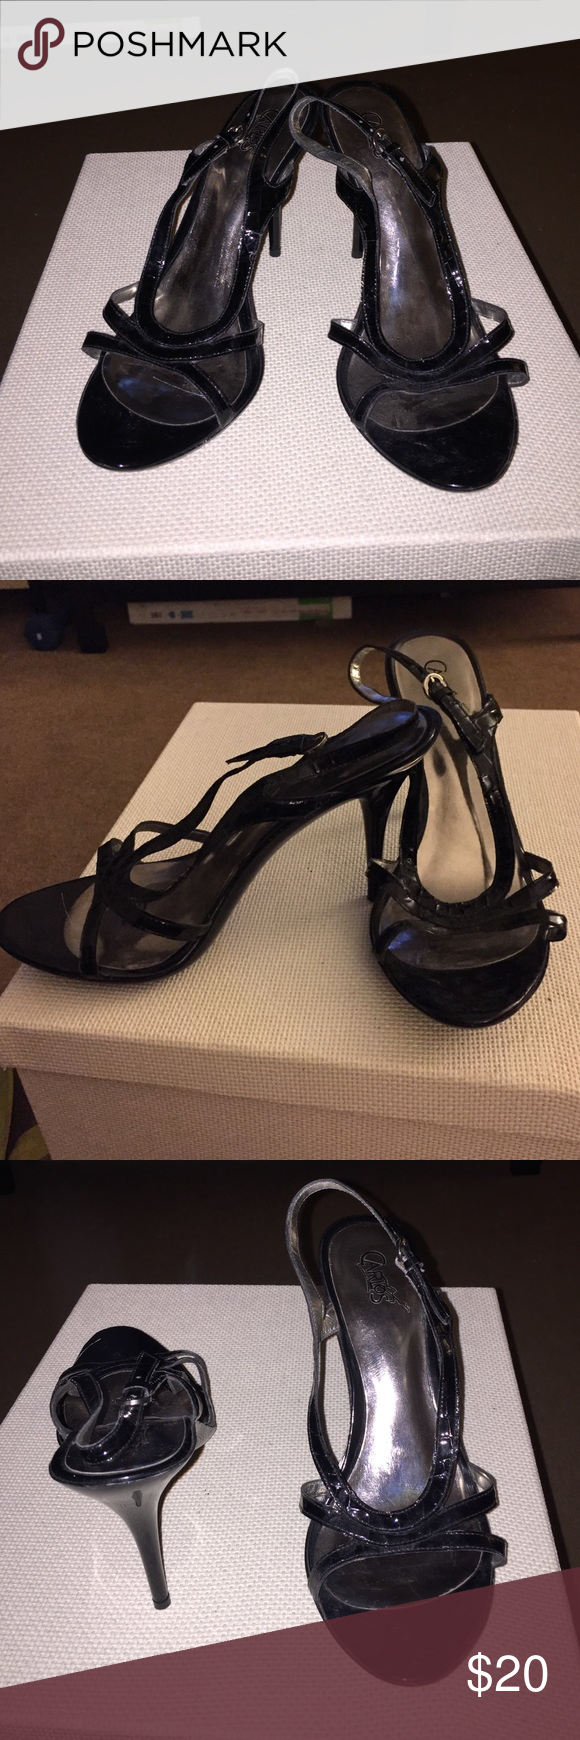 Black sandals 2 inch heel - Carlos Santana Straps Black Heeled Sandals